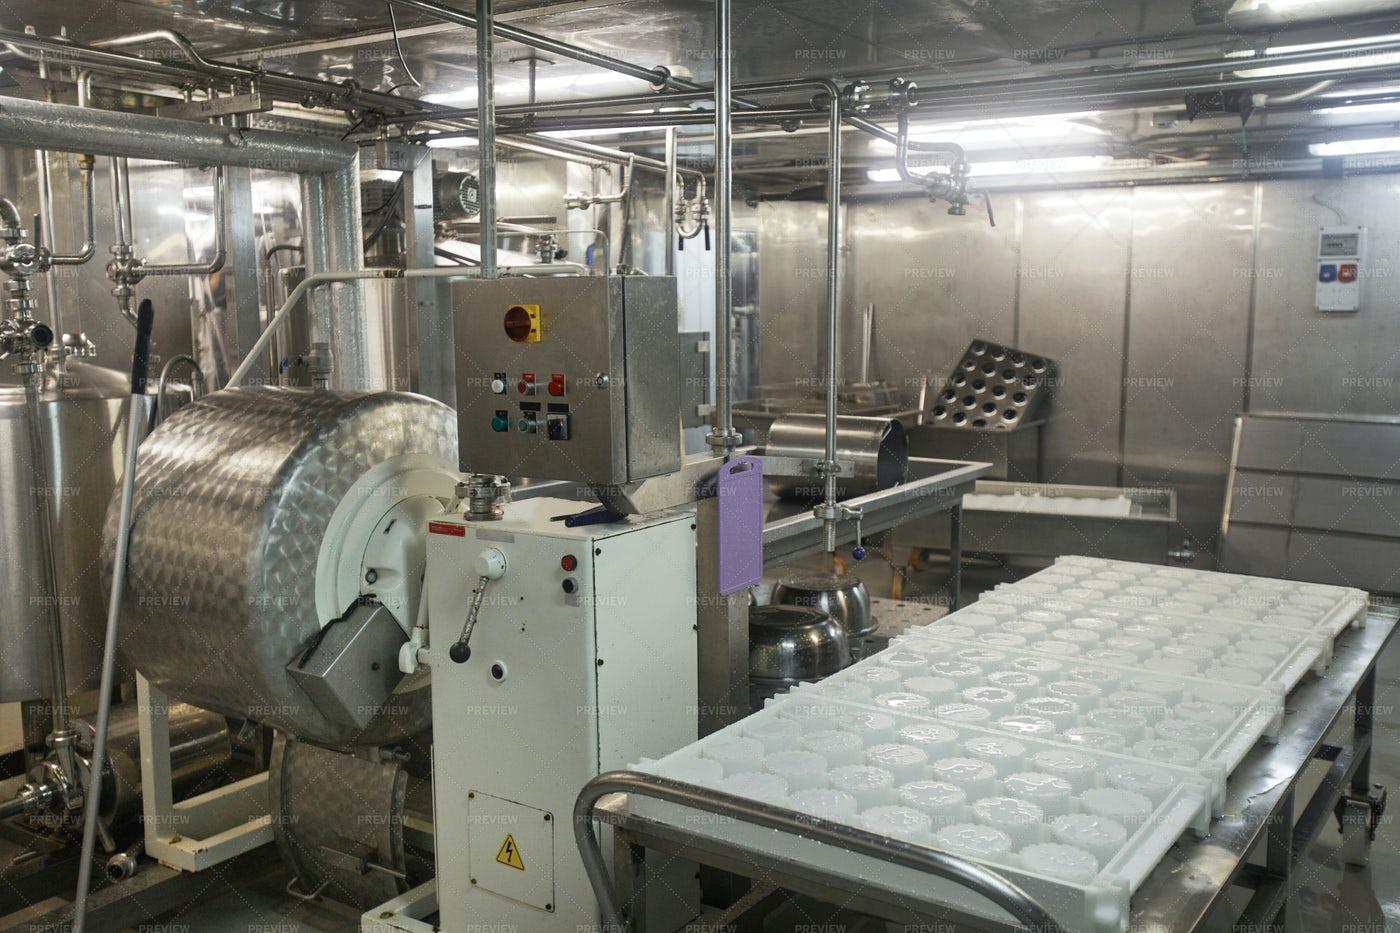 Background Of Steel Equipment: Stock Photos